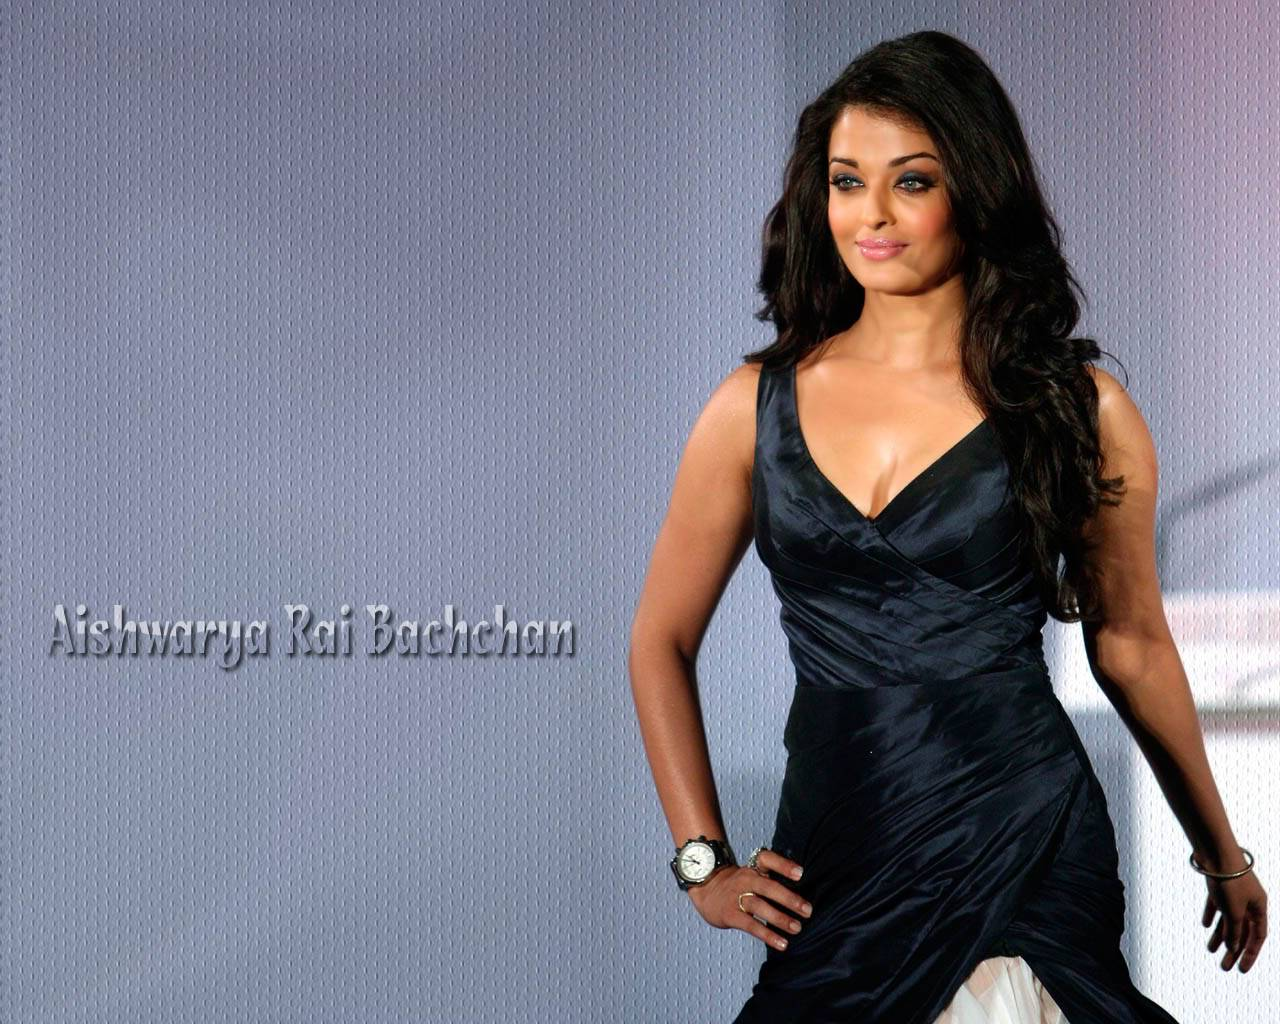 Aishwarya Rai thread - Mega Hot HQ Collection - Page 2 Aishwarya_Rai_b_316_1228550750